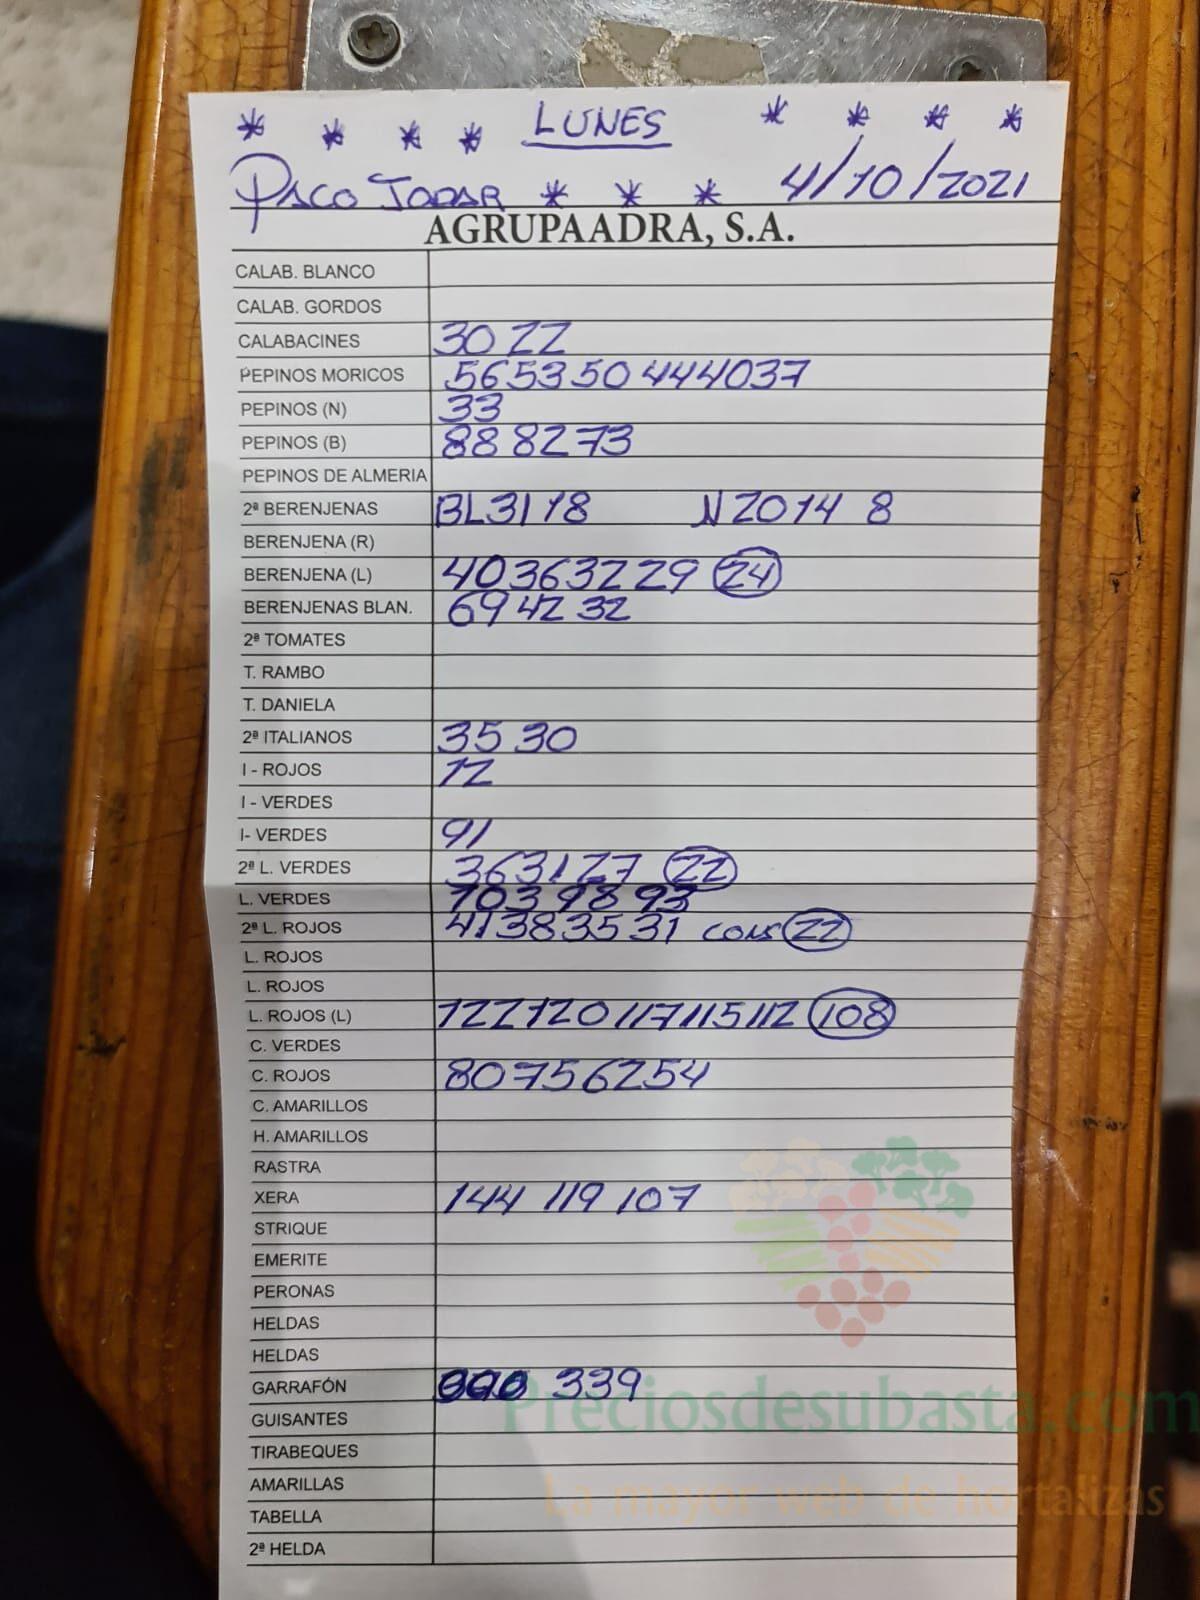 Subasta hortofrutícola AgrupaAdra 4 de octubre 2021